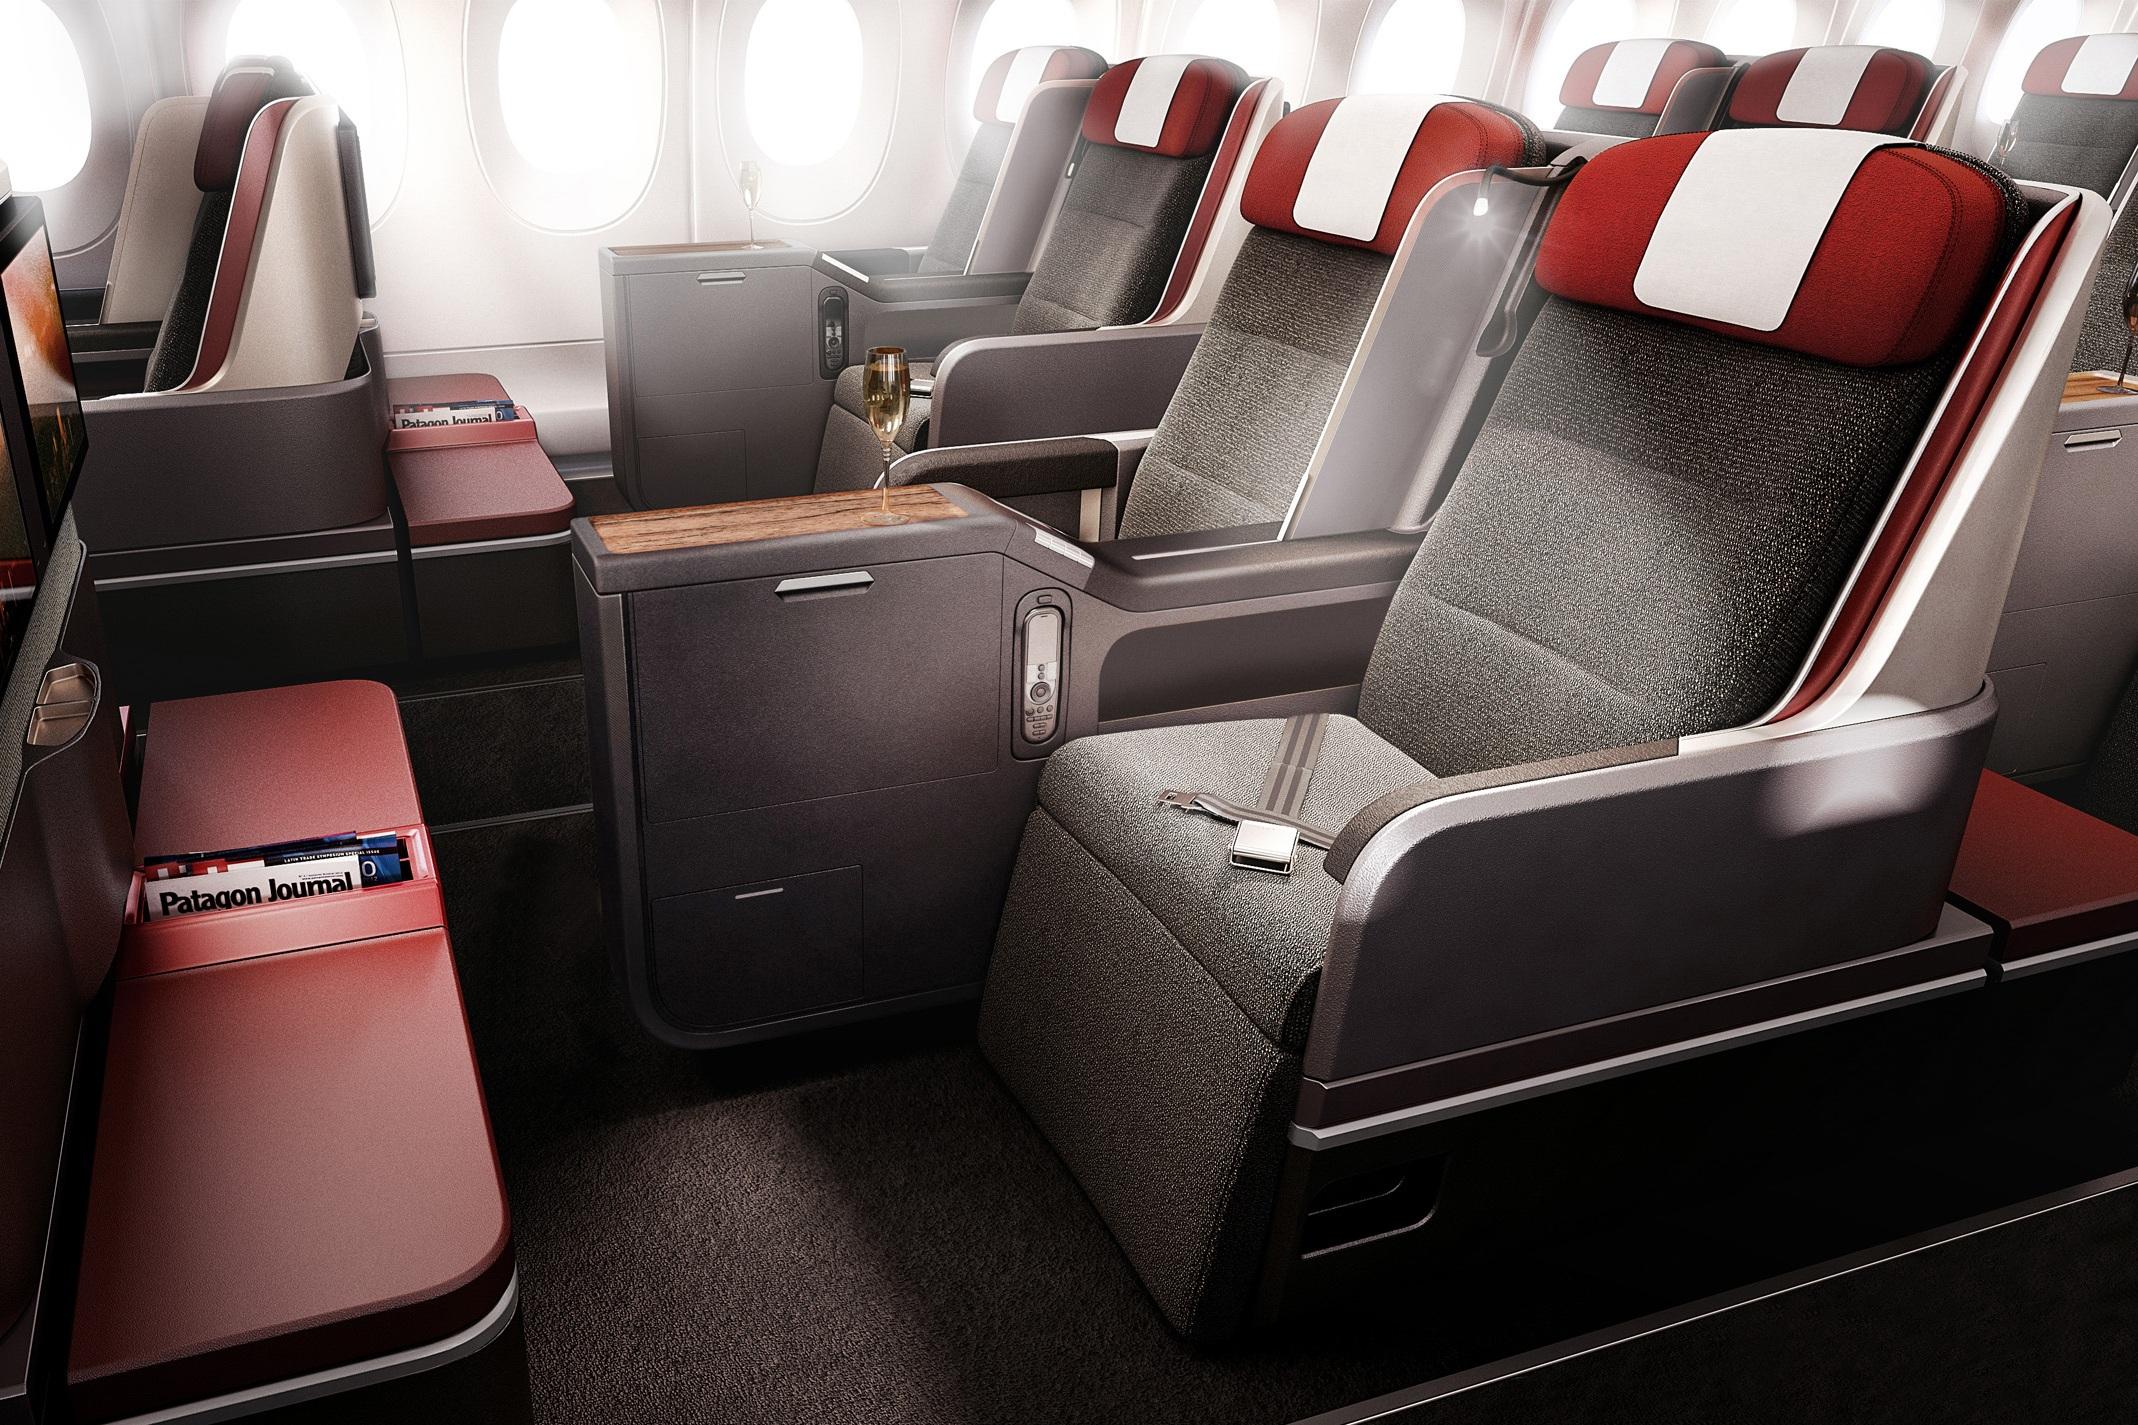 Fly LATAM business class on an Asia Miles multi-carrier award!